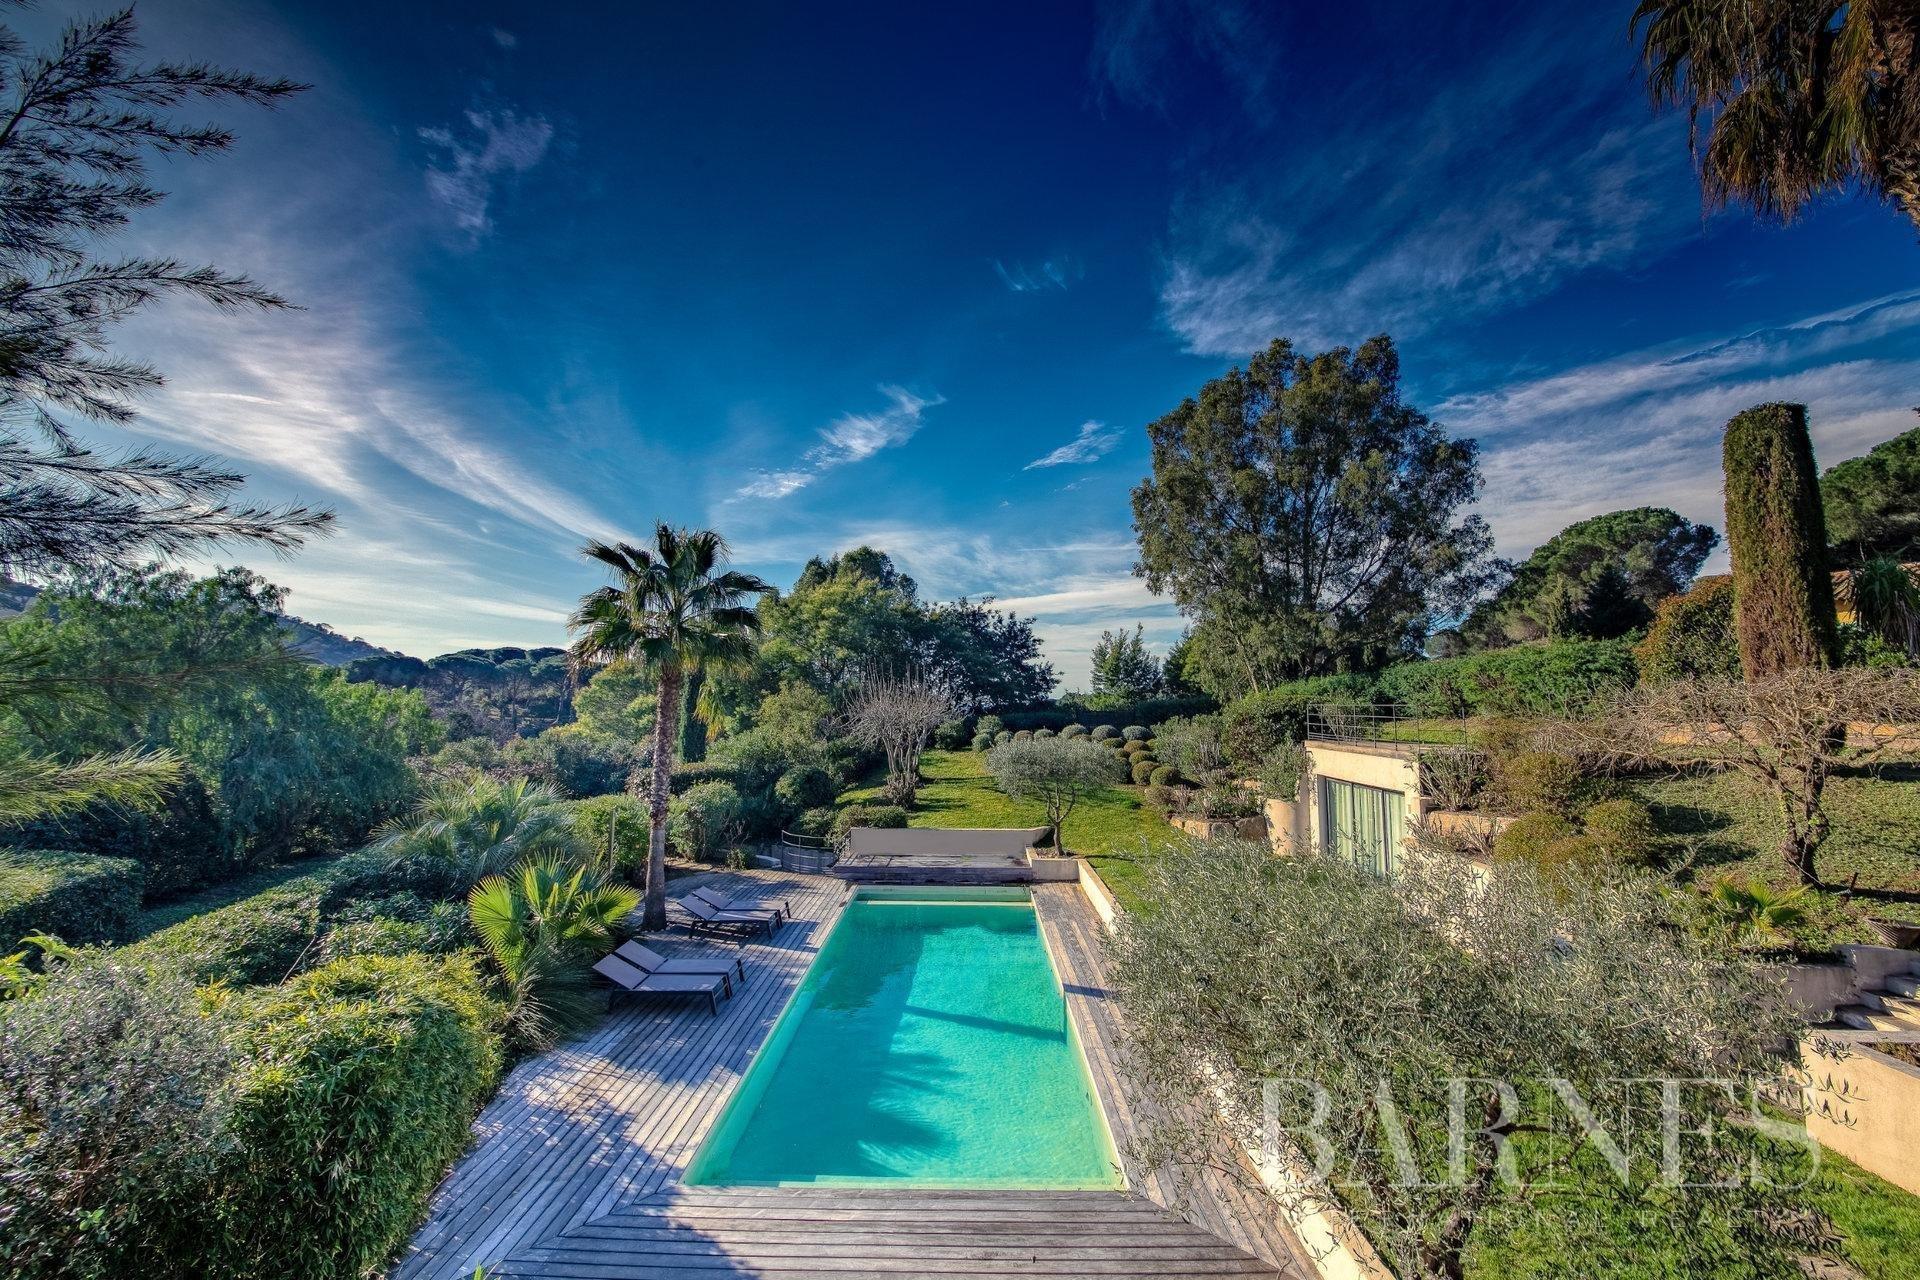 Villa in La Croix-Valmer, Provence-Alpes-Côte d'Azur, France 1 - 10886816